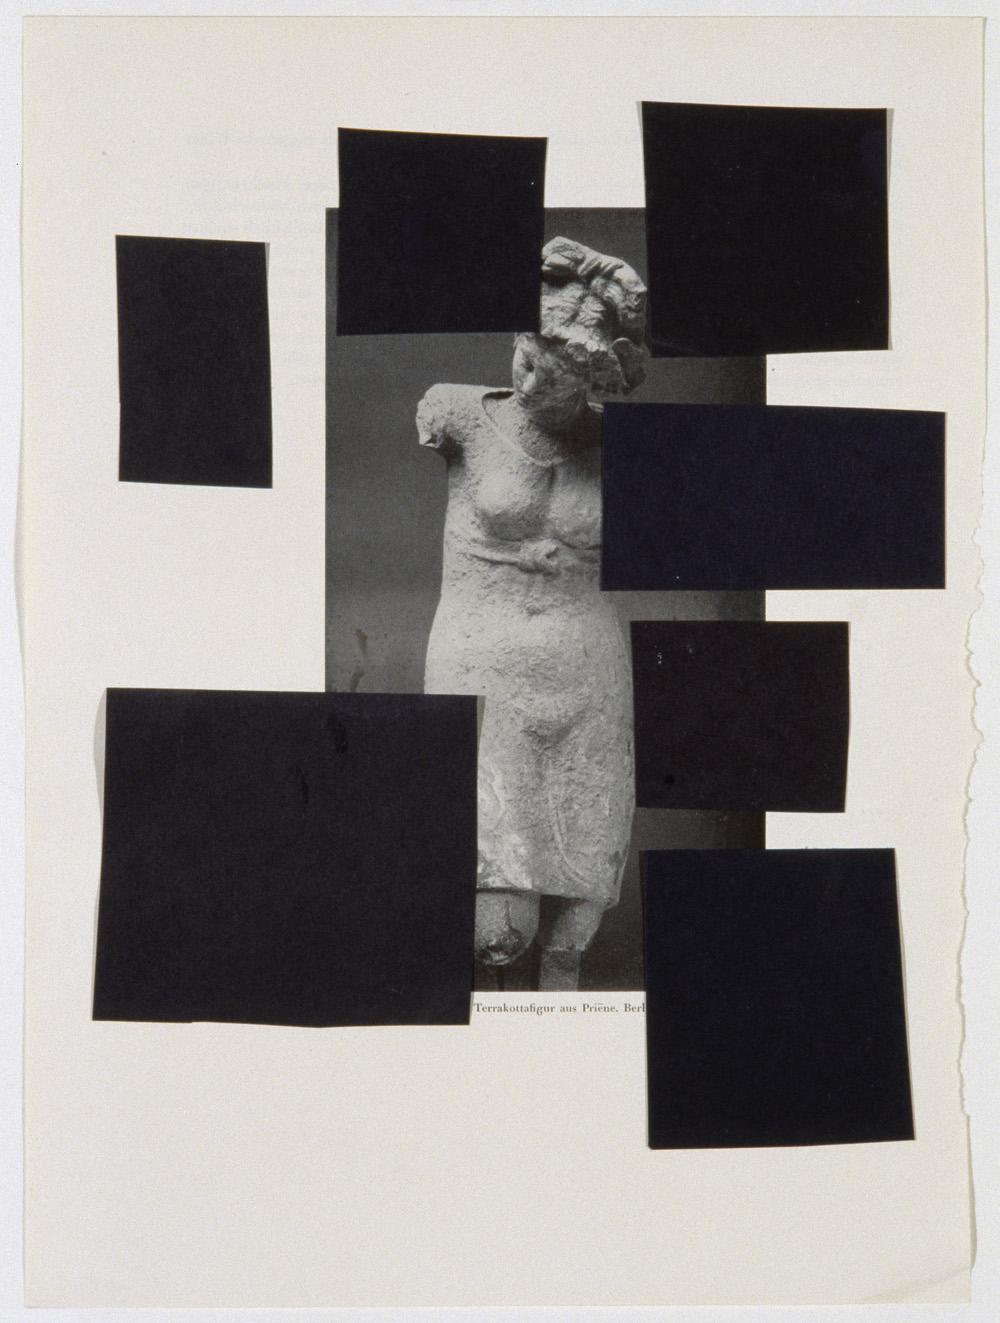 Richard Hawkins, Union of Eroticized Gender with Abstract Overlay / Surplus ,2006,Collage,29.2 x 21.6 cm,Courtesy Corvi-Mora, London